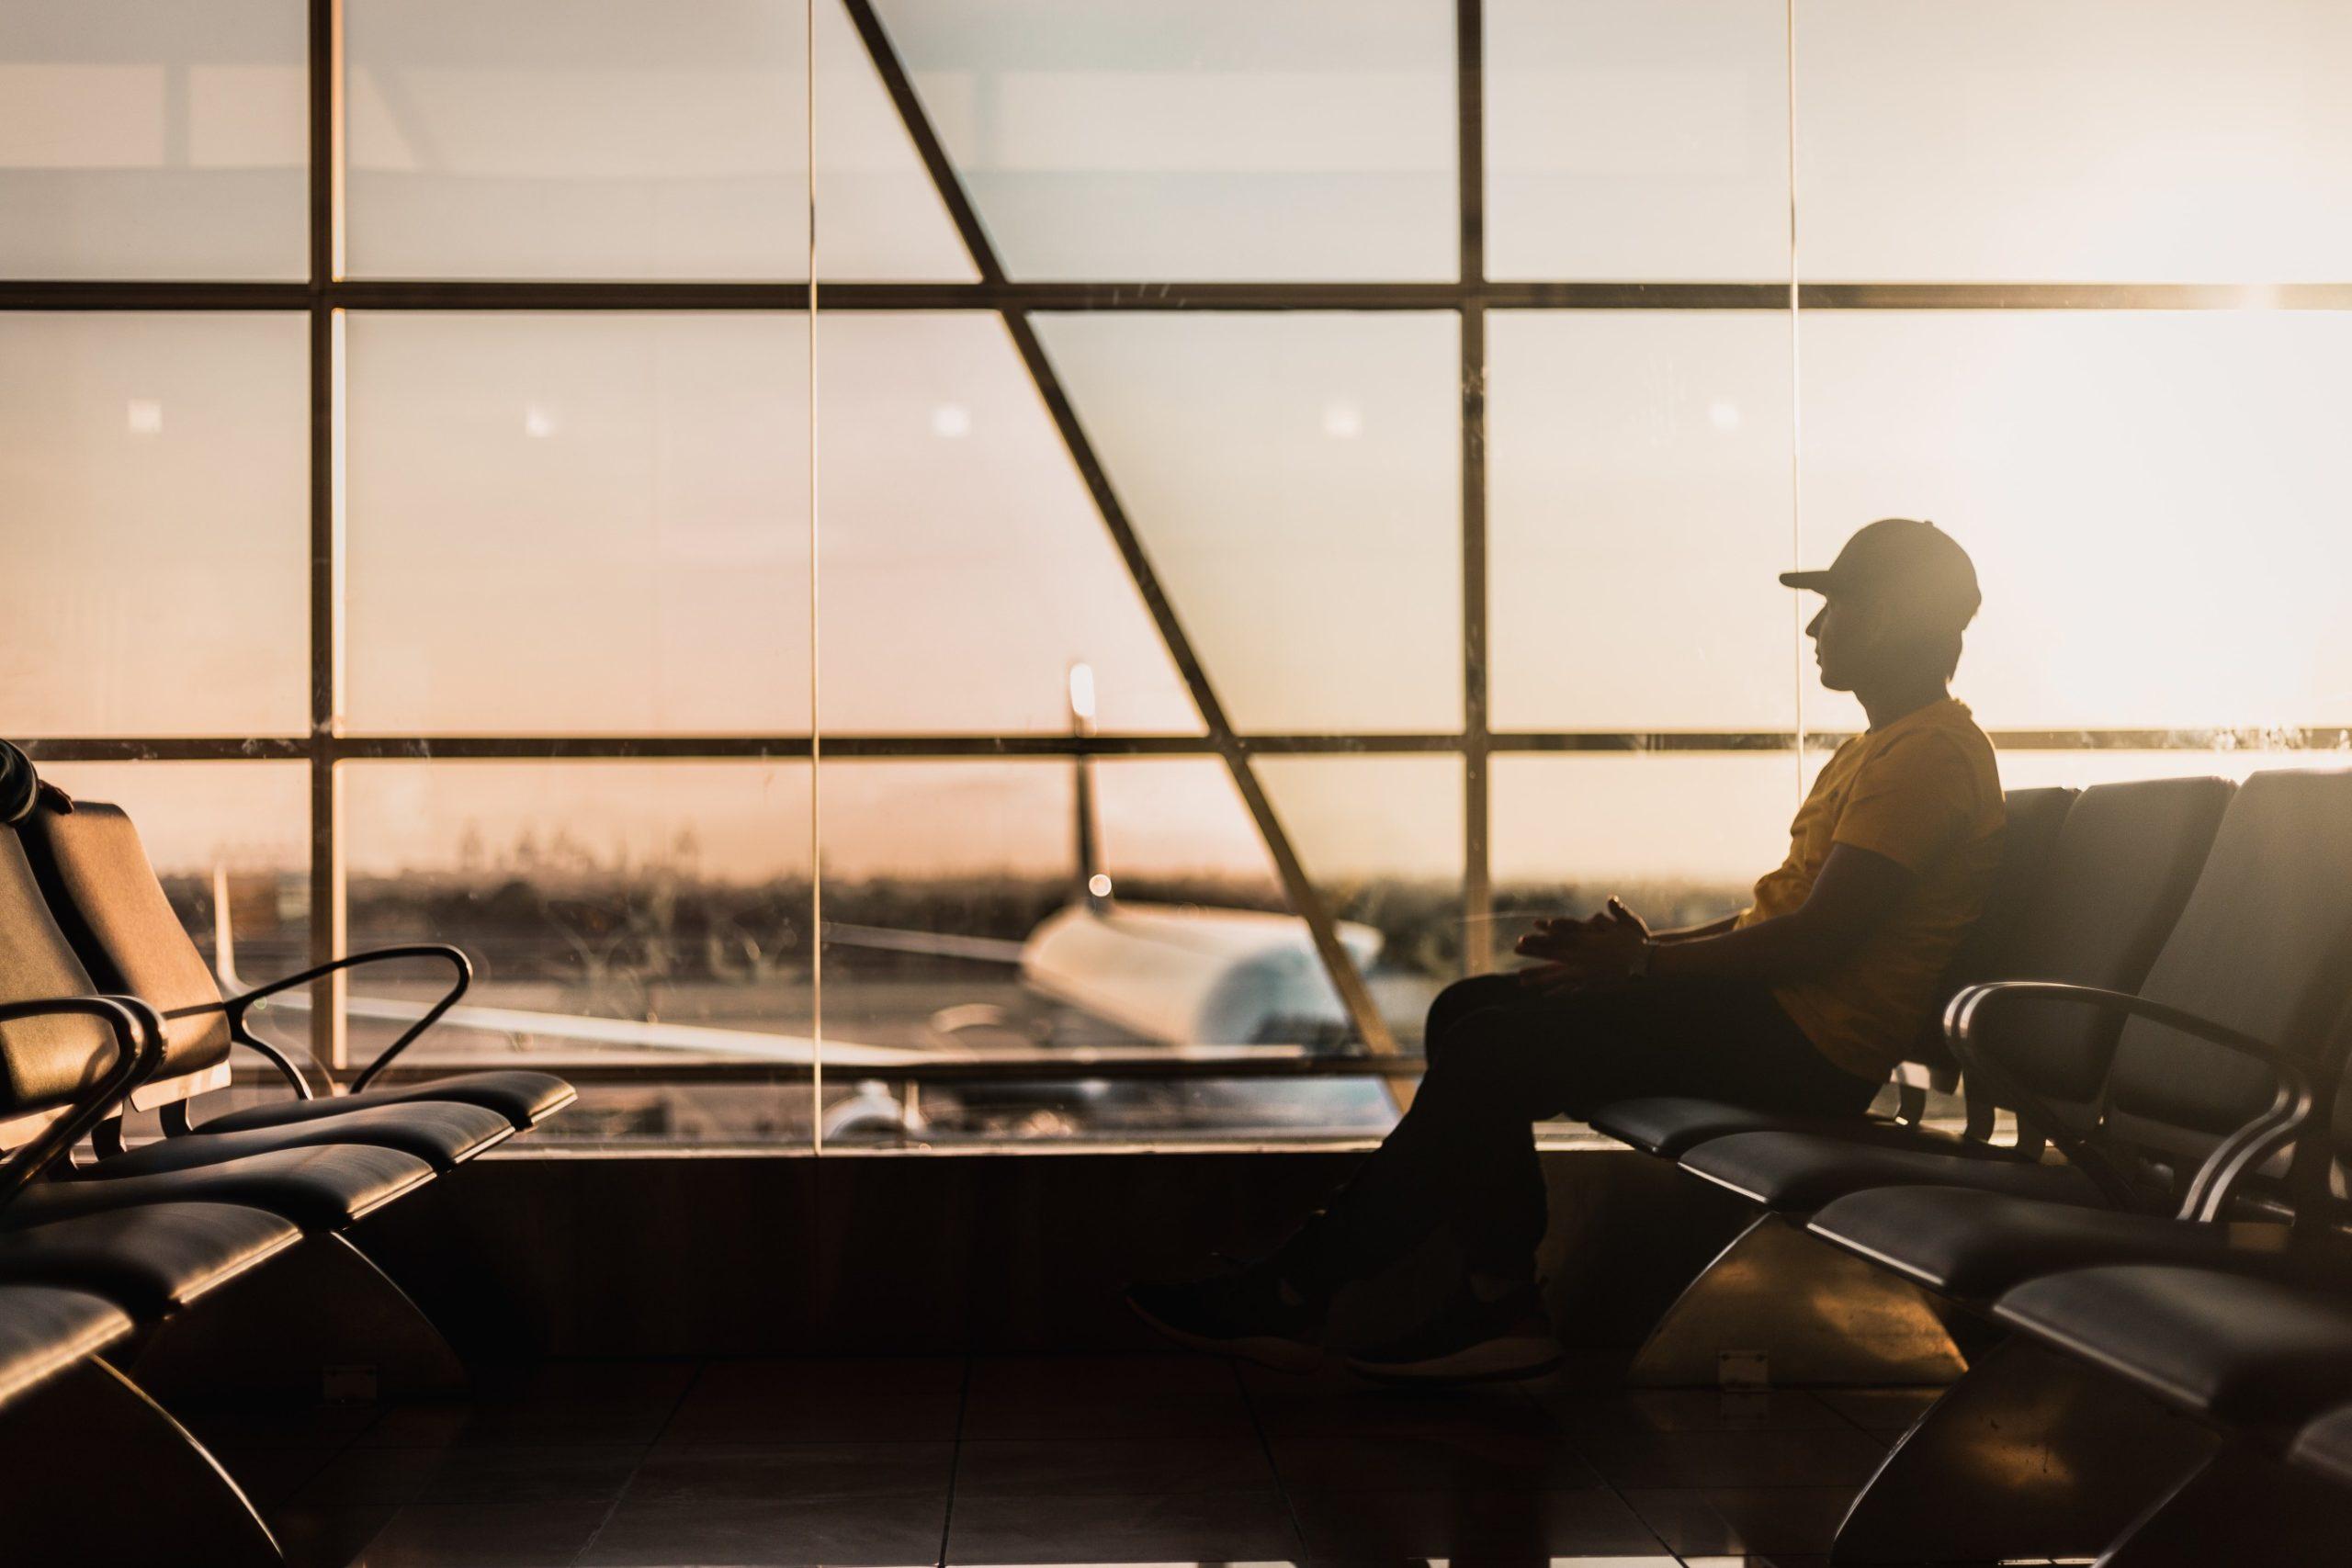 UE acuerda pasaporte Covid-19 para reactivar viajes de verano